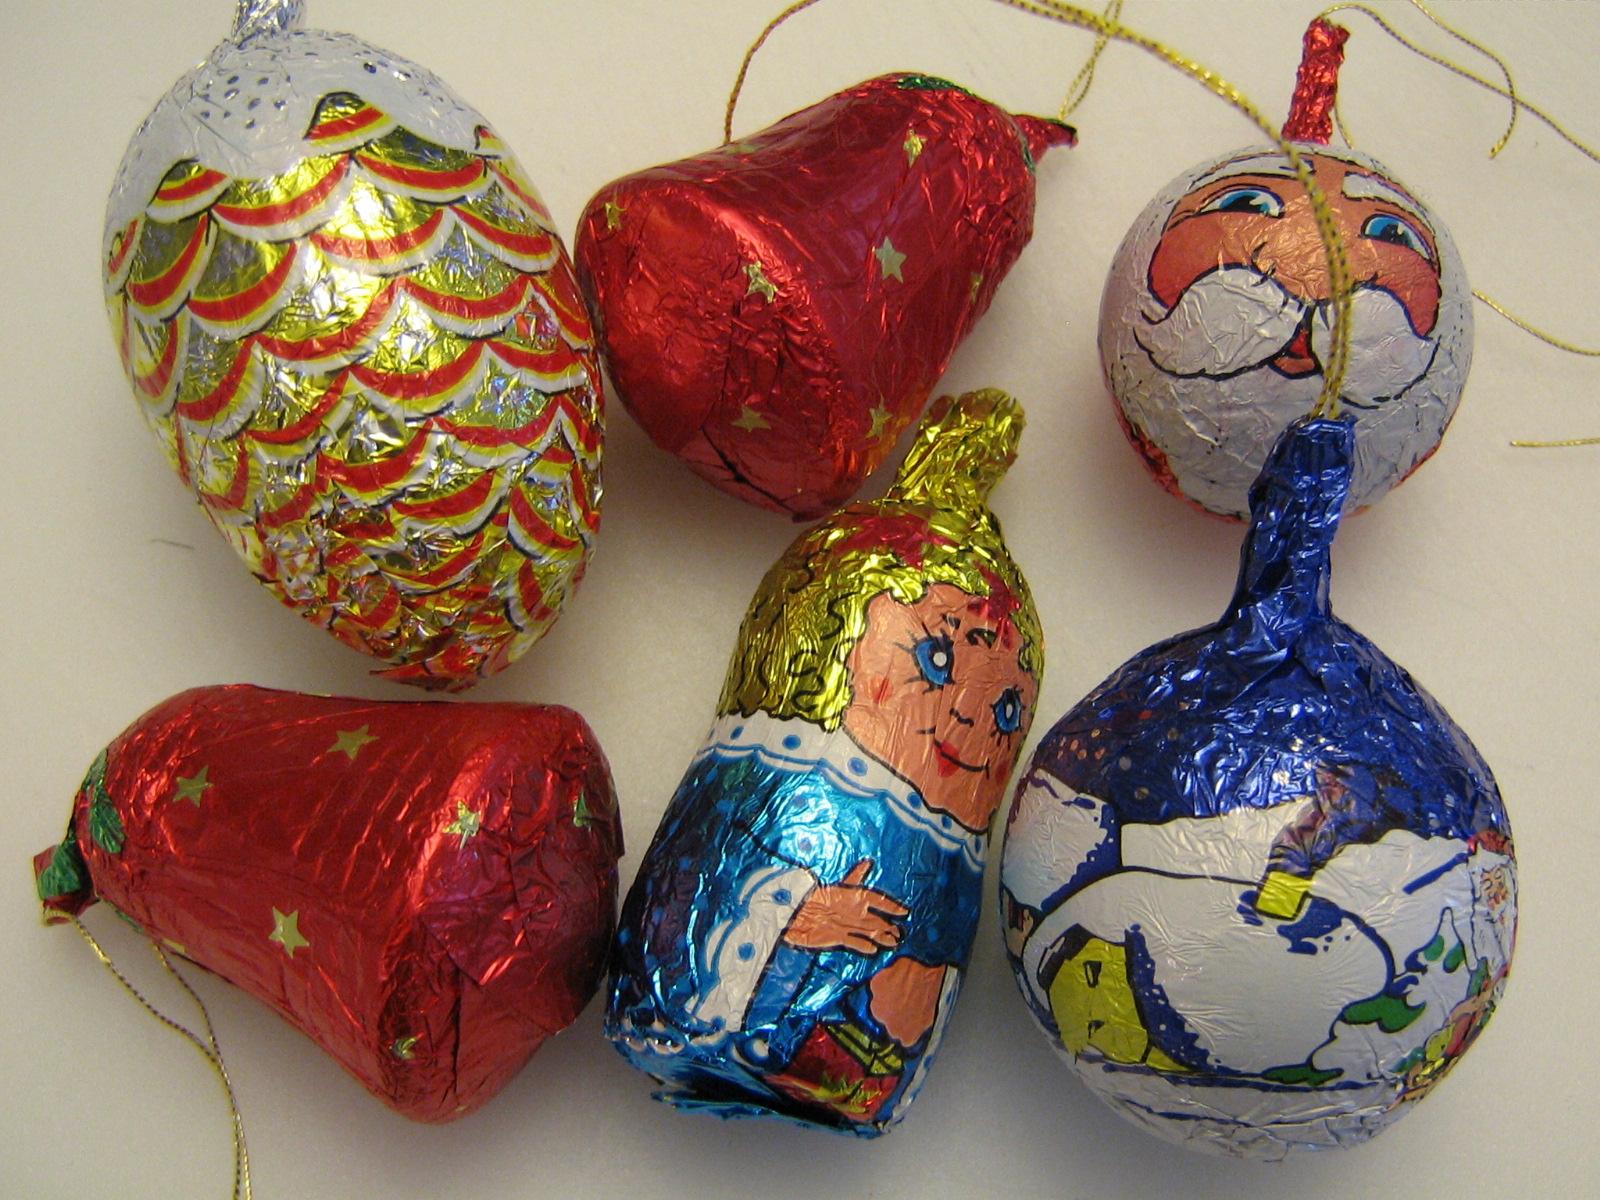 Chocolate Christmas Tree Decorations Asda : Quanto basta this christmas tree looks good enough to eat